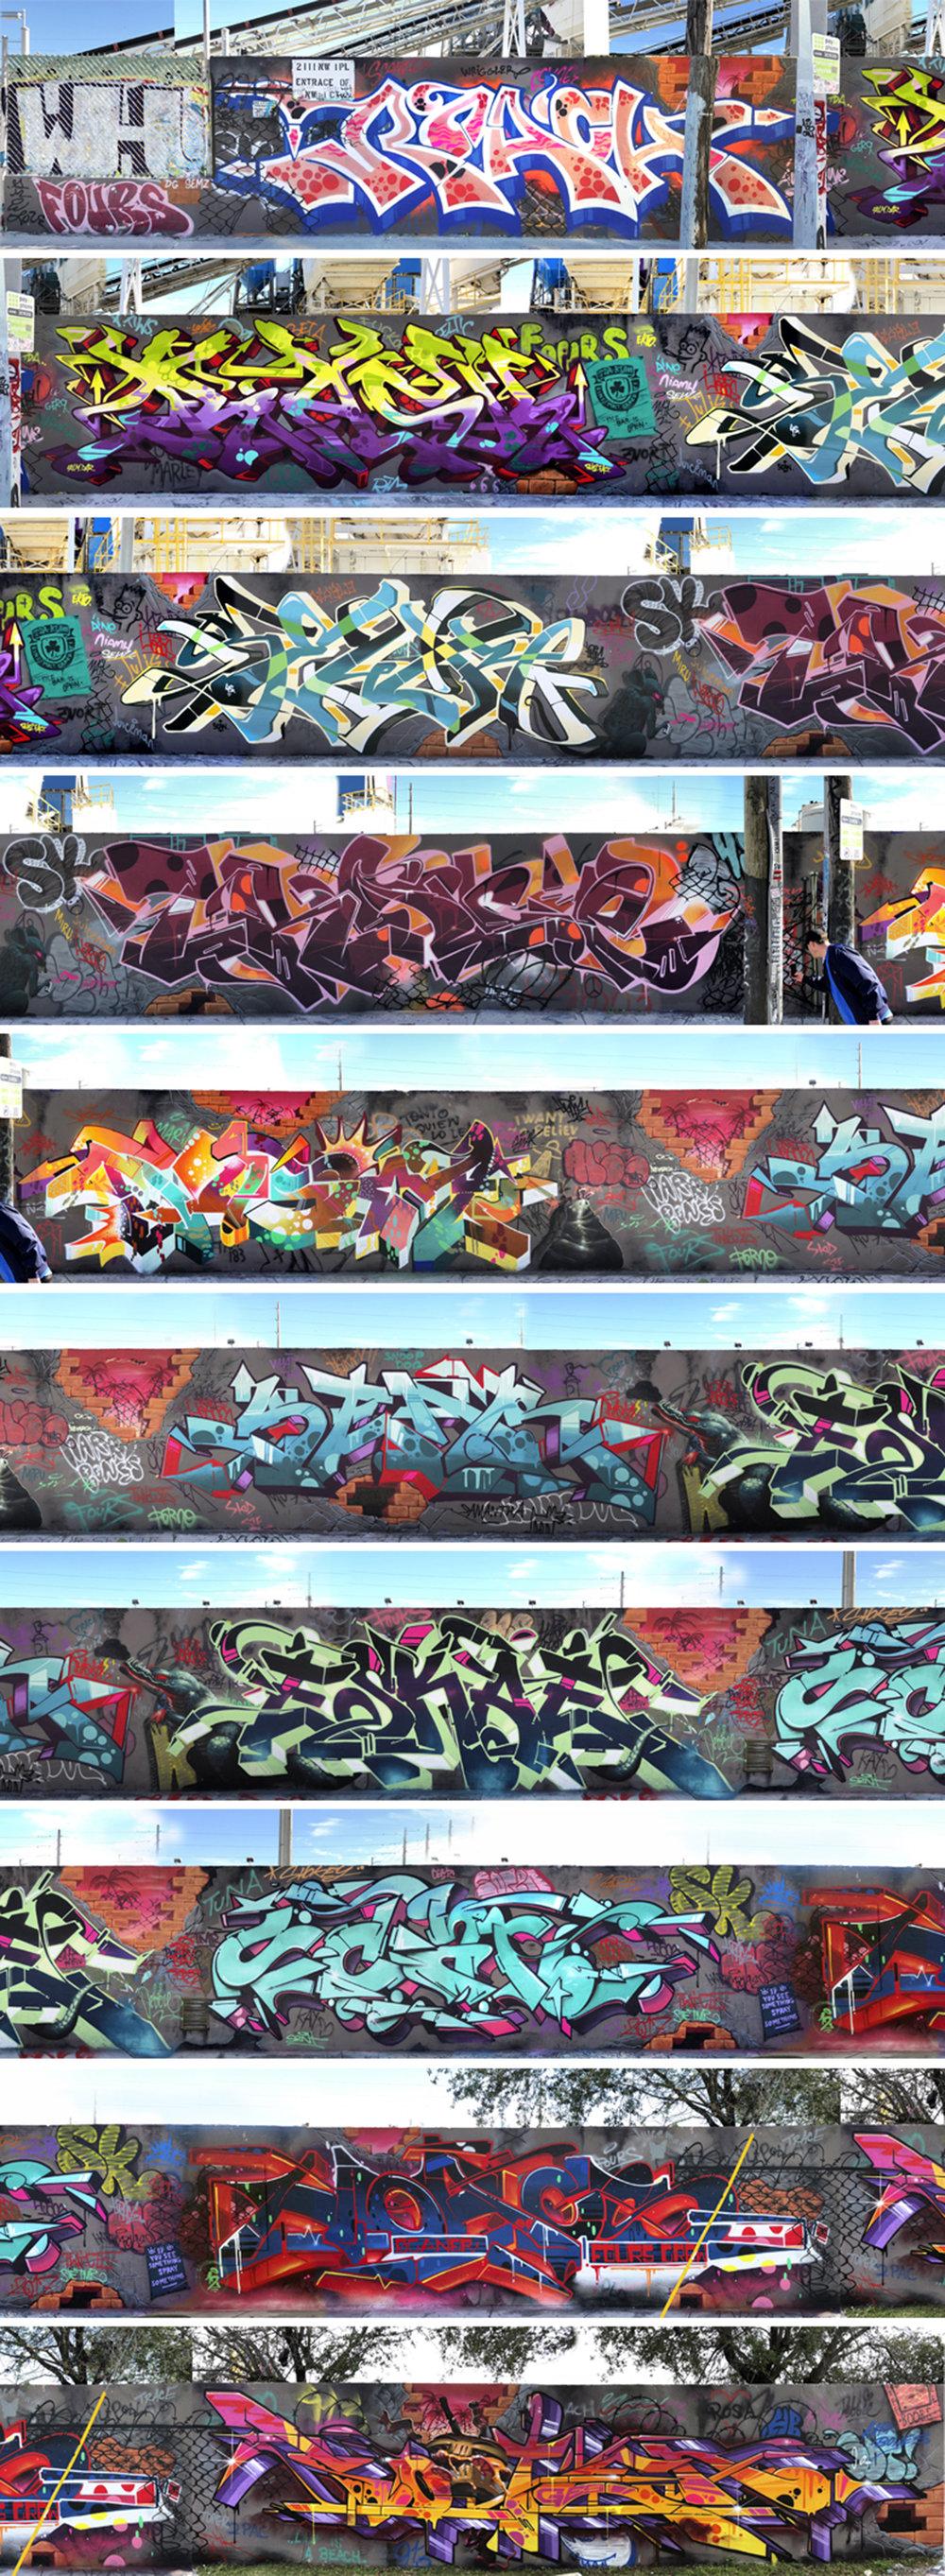 fours-wall-artbasel-17.jpg